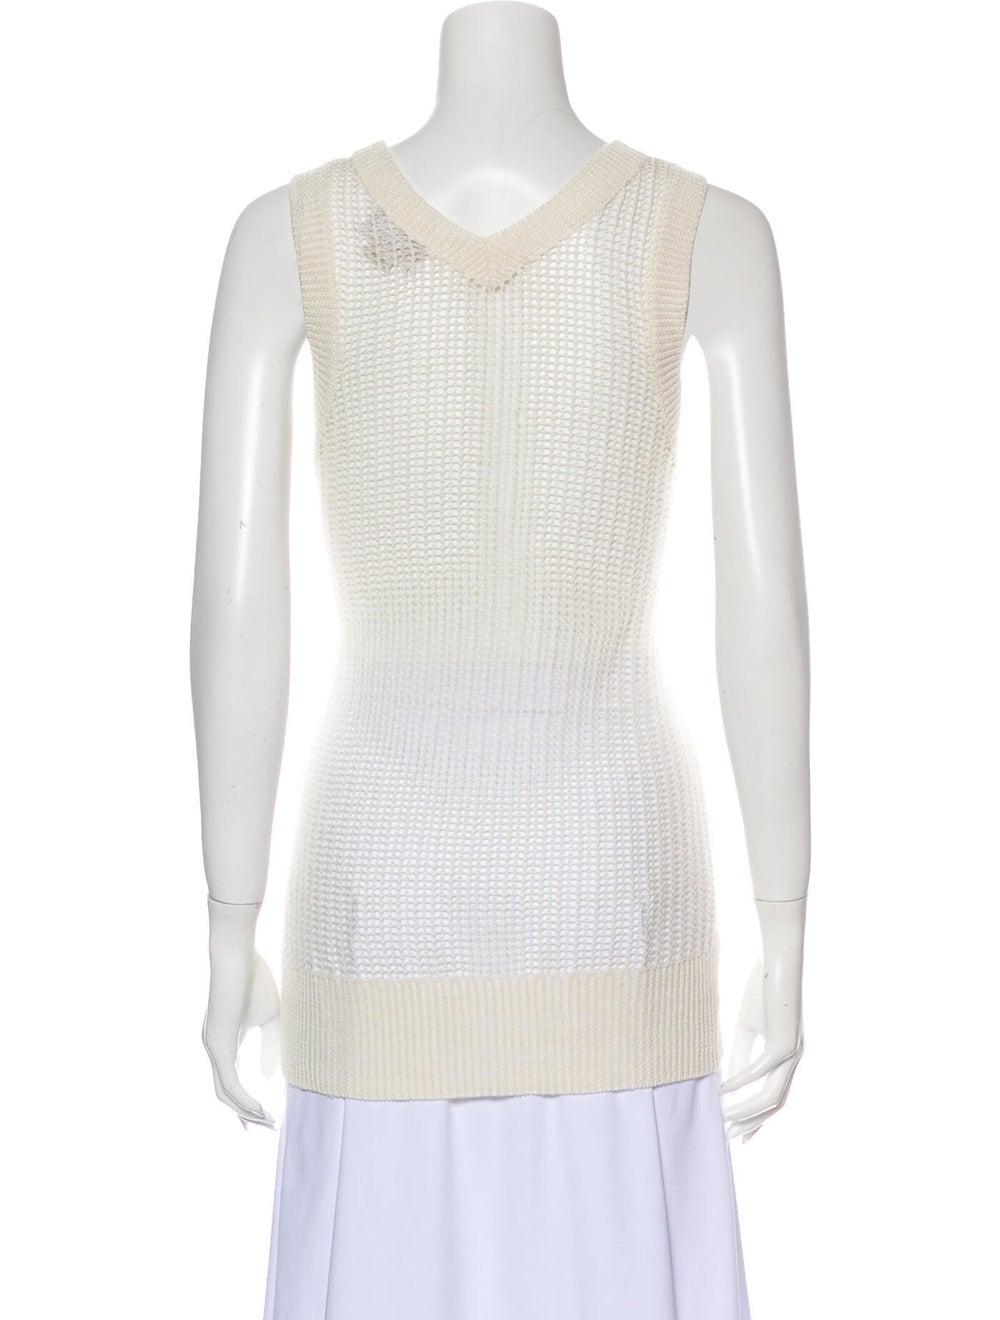 M.patmos Linen Scoop Neck Sweater White - image 3